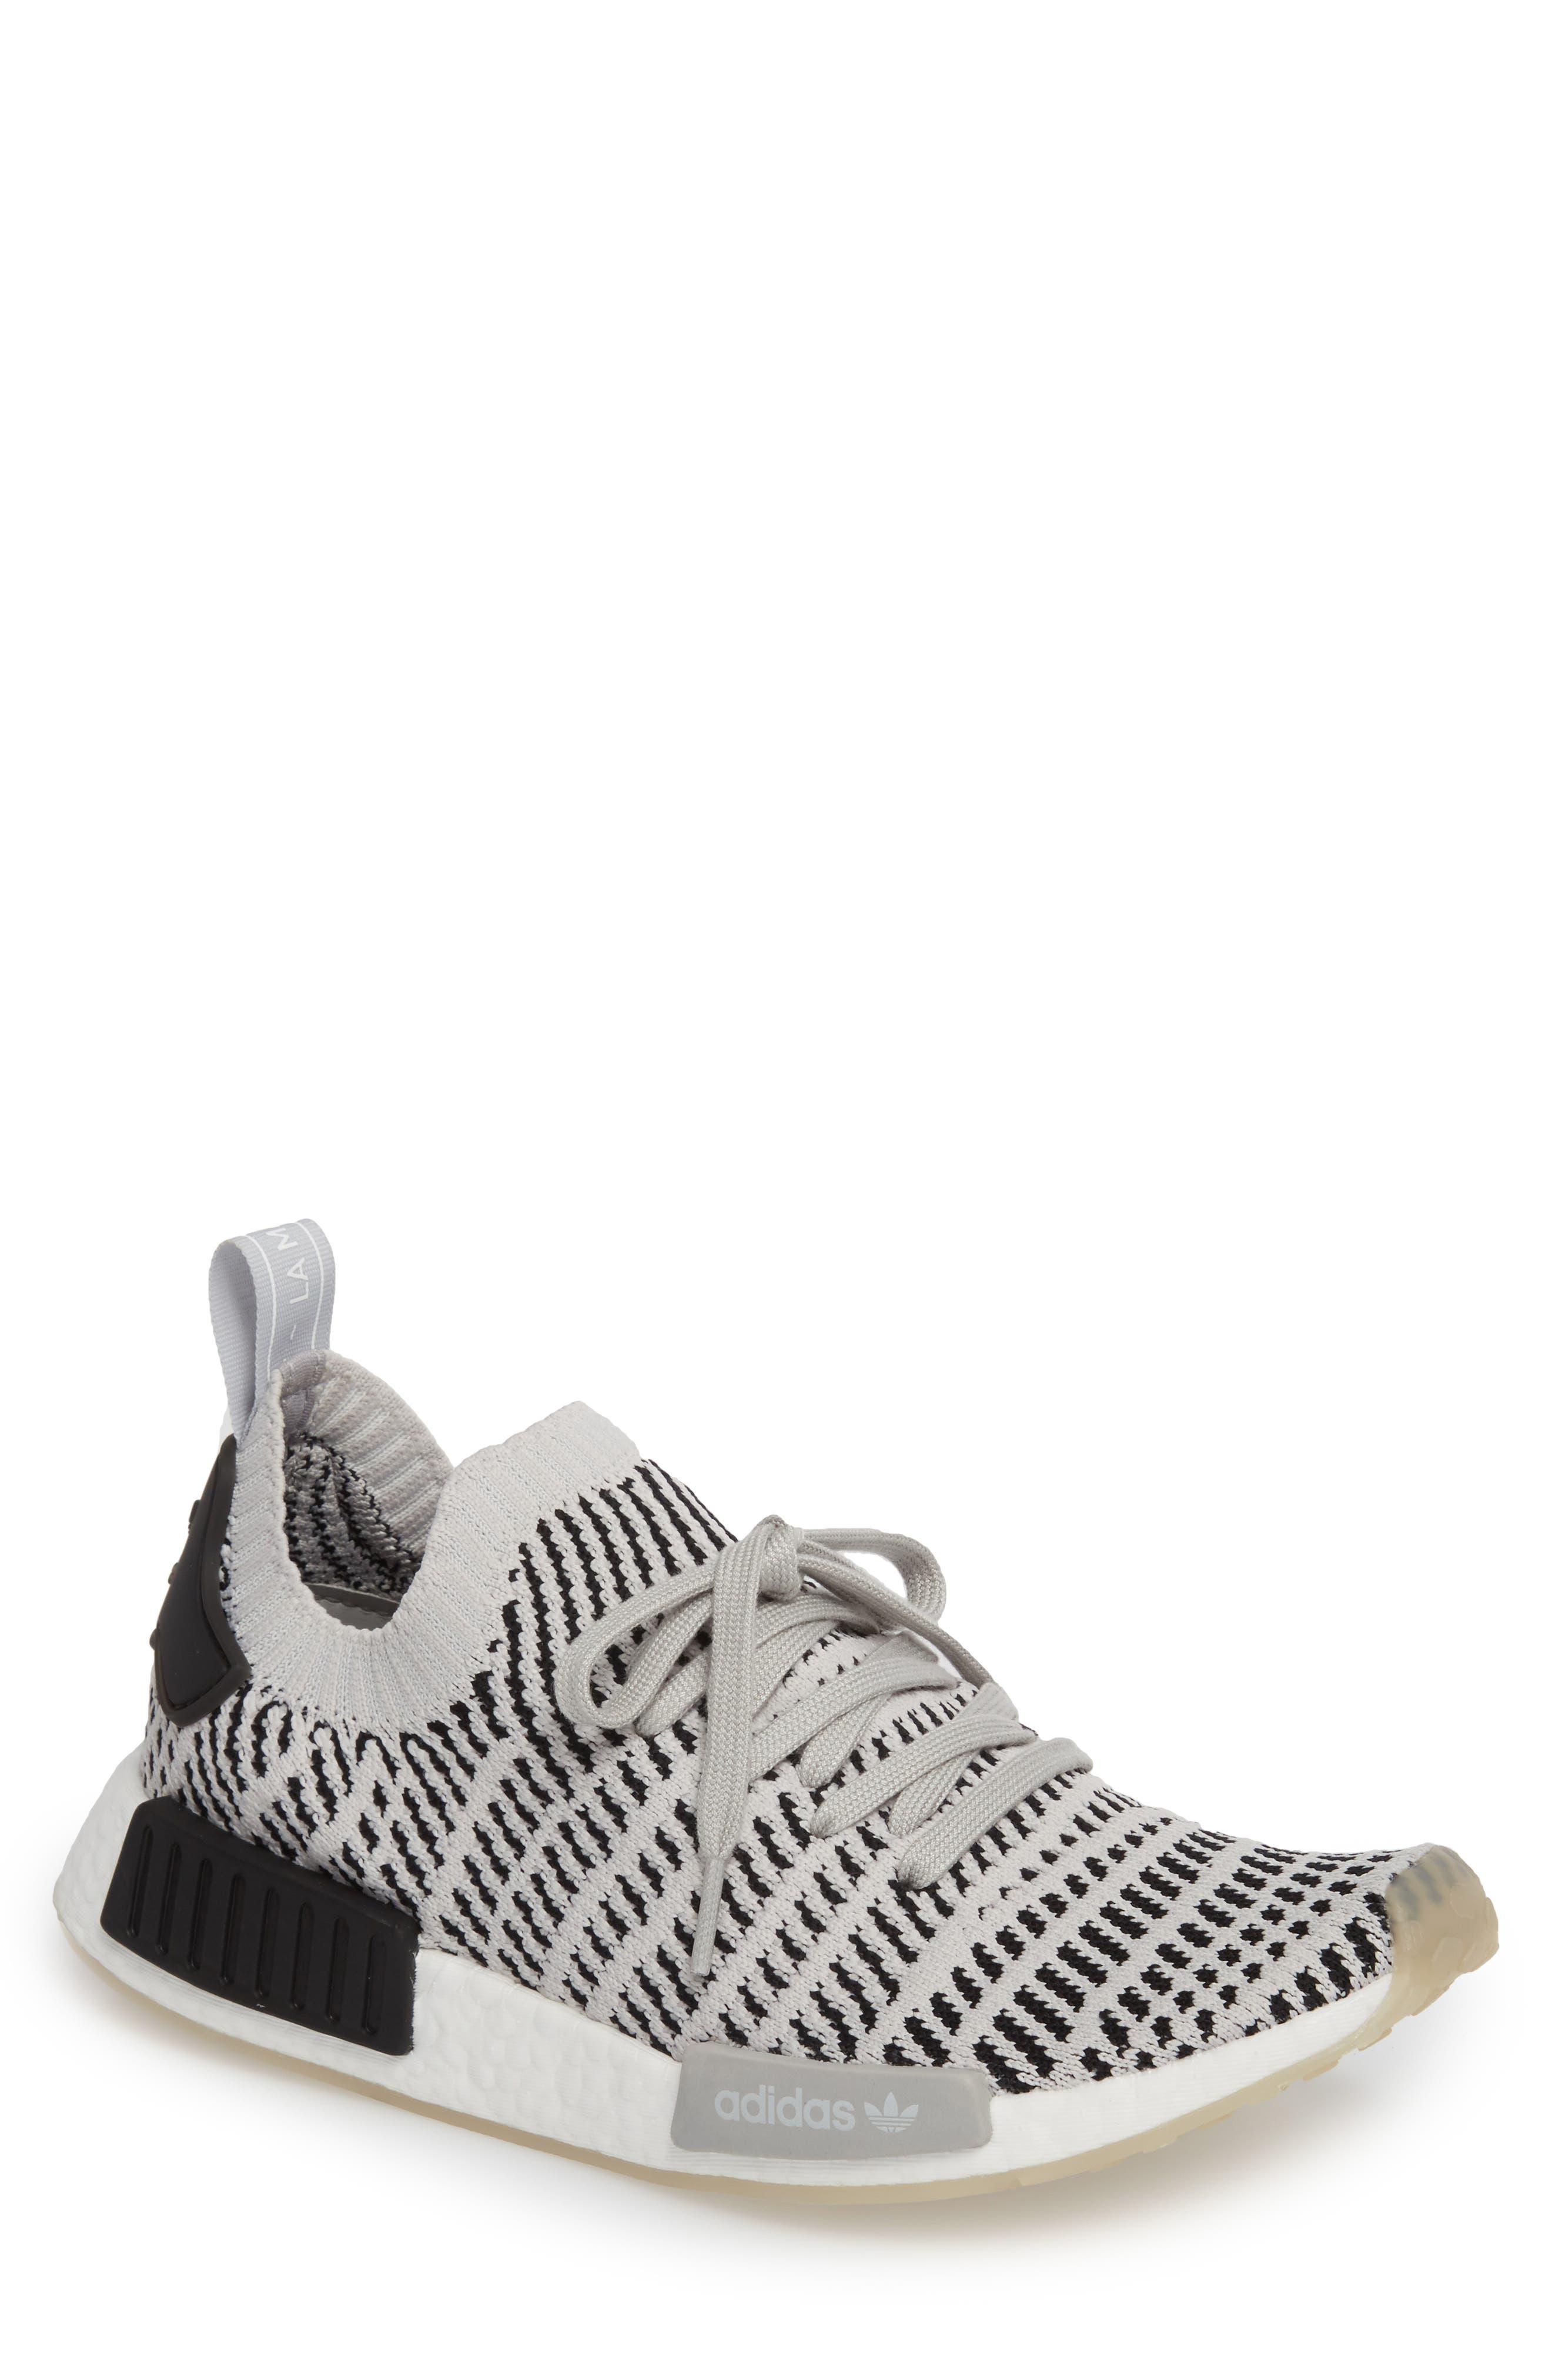 NMD R1 STLT Primeknit Sneaker,                             Main thumbnail 1, color,                             Grey/ Core Black